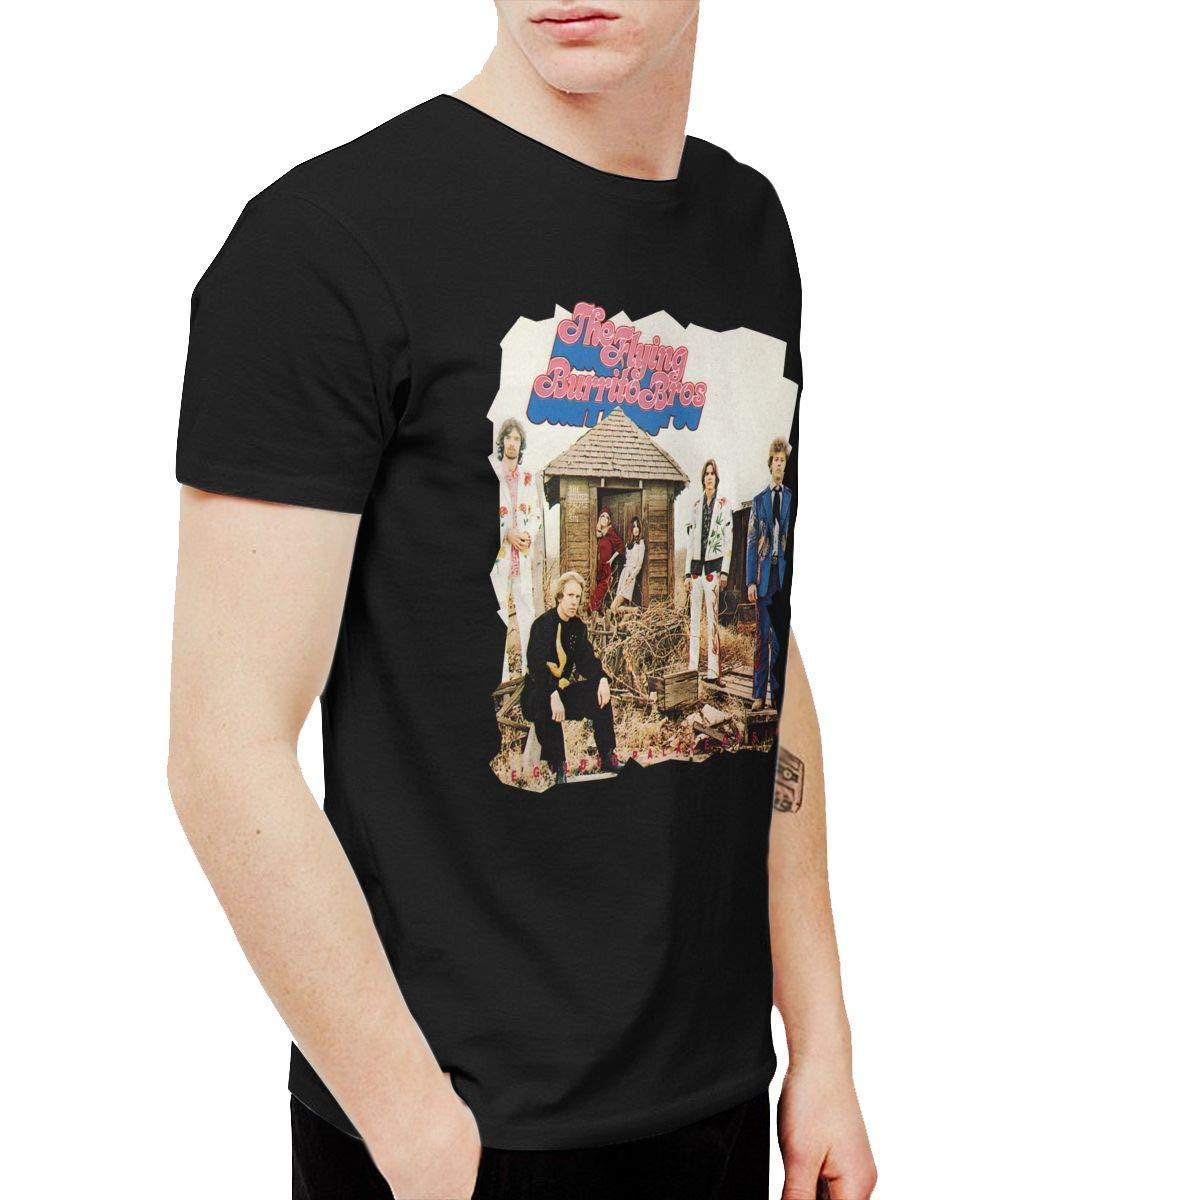 K-deio The Flying Burrito Brothers Wild Horses Mens T Shirts Black